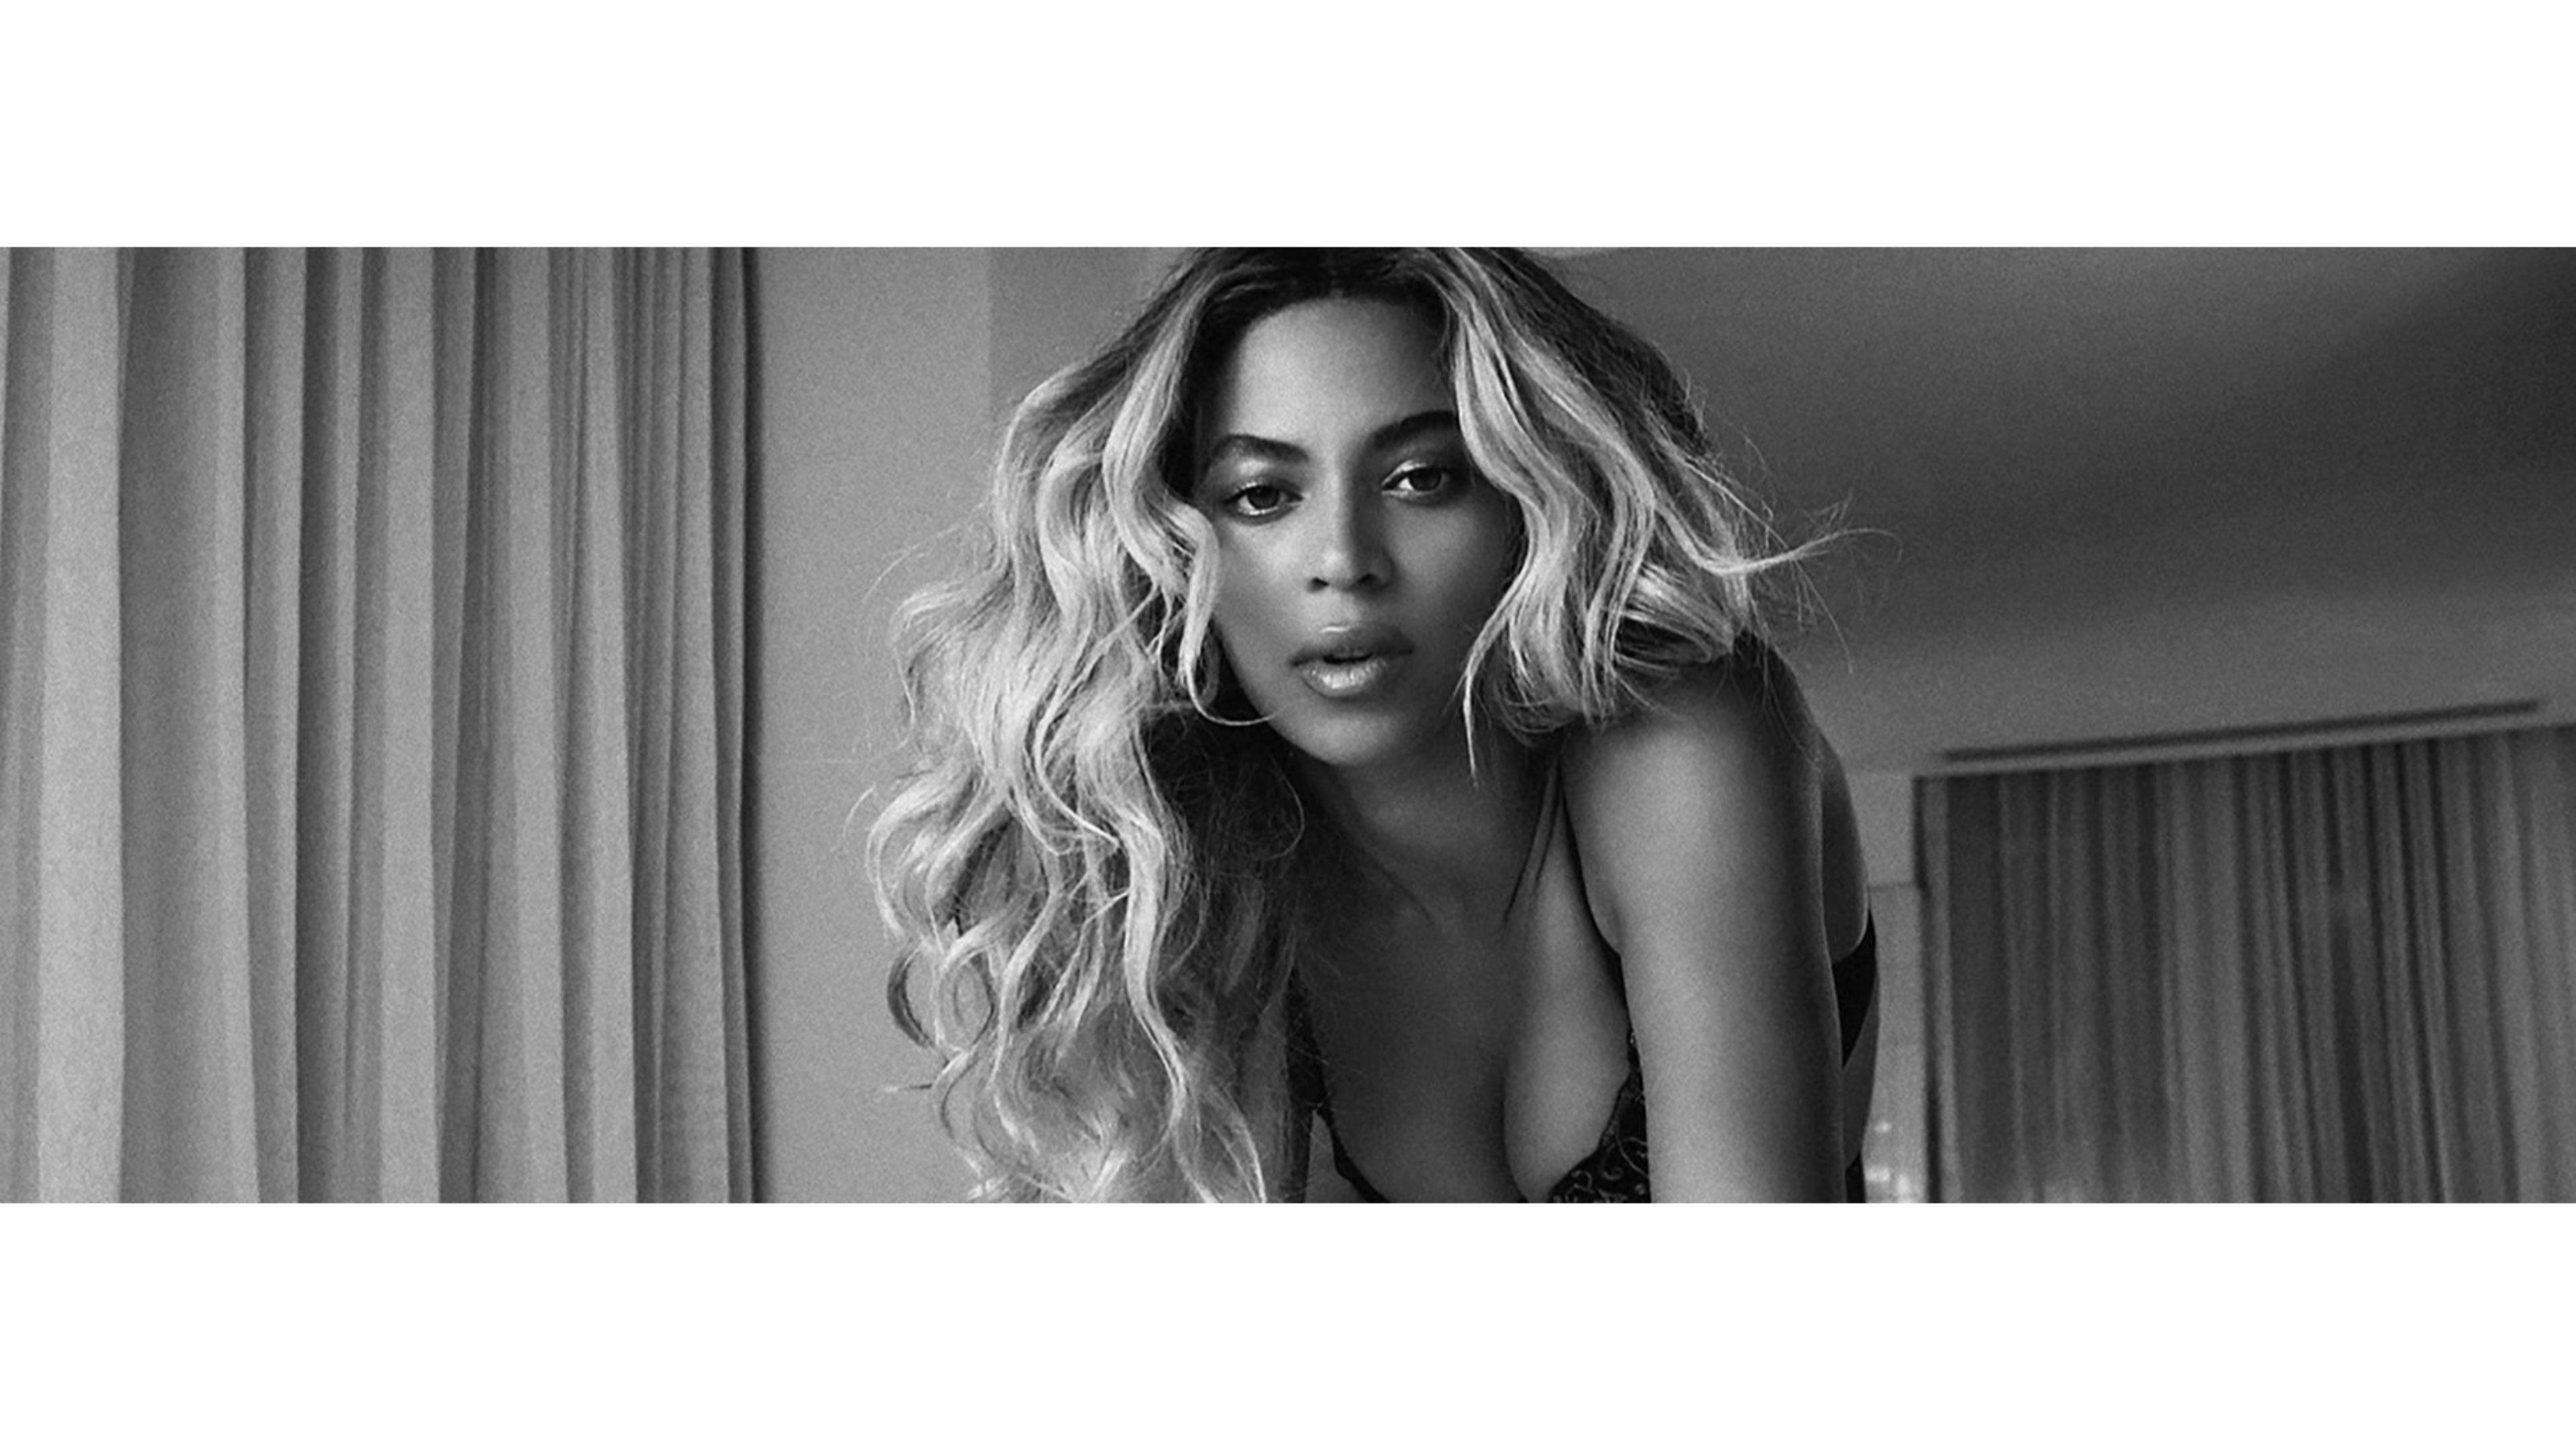 Beyonce Wallpaper Hd Free Download Wallpapers 4k Pinterest